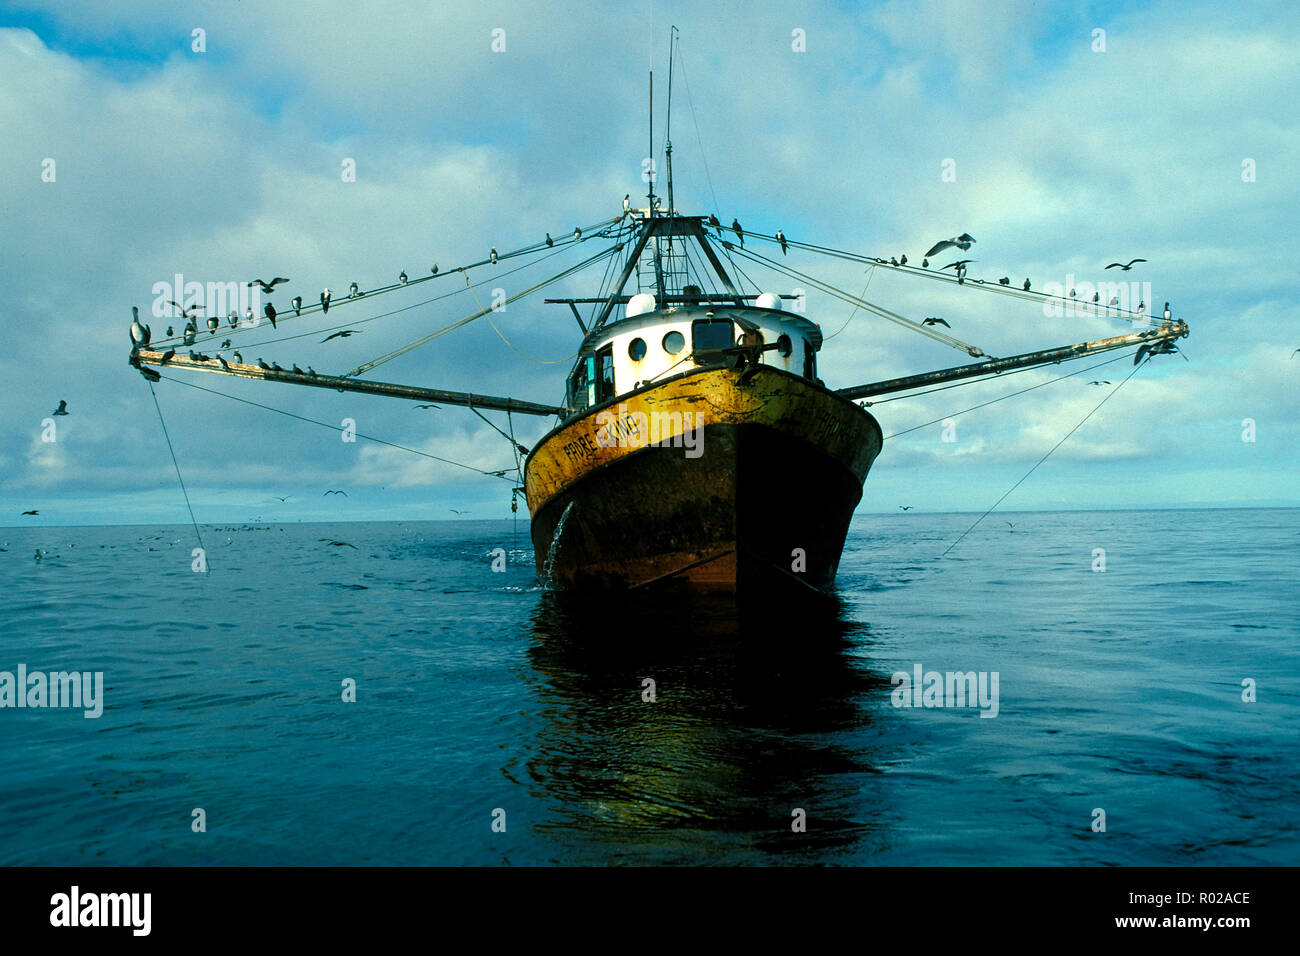 Shrimp Drag Net Stock Photos & Shrimp Drag Net Stock Images - Alamy